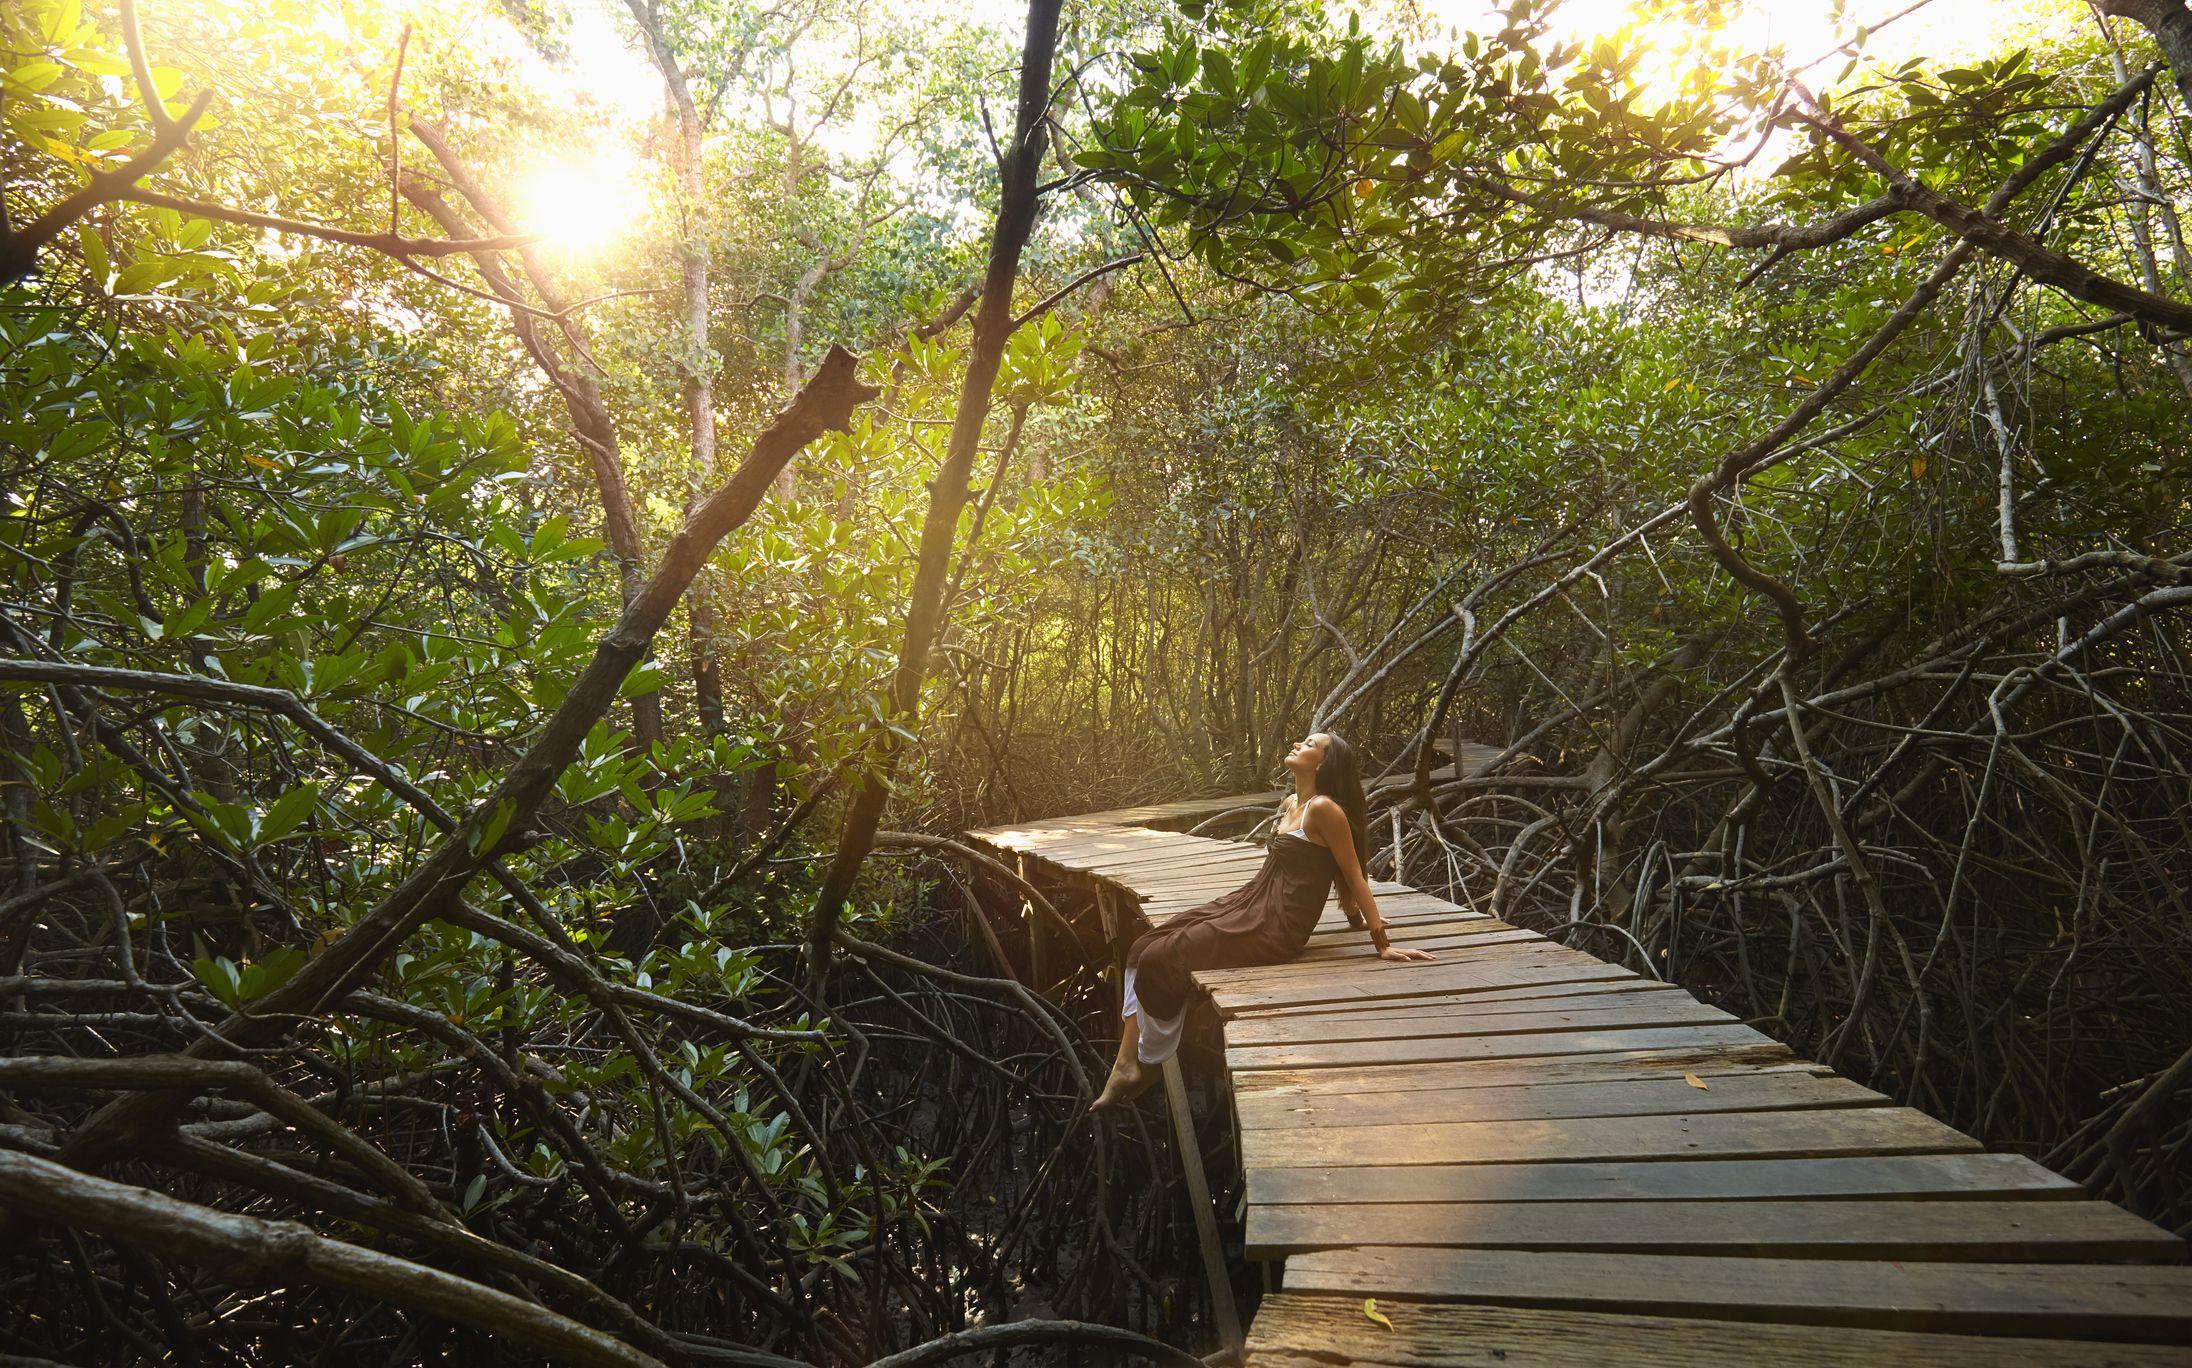 Pacific Islander woman sitting on walkway in jungle